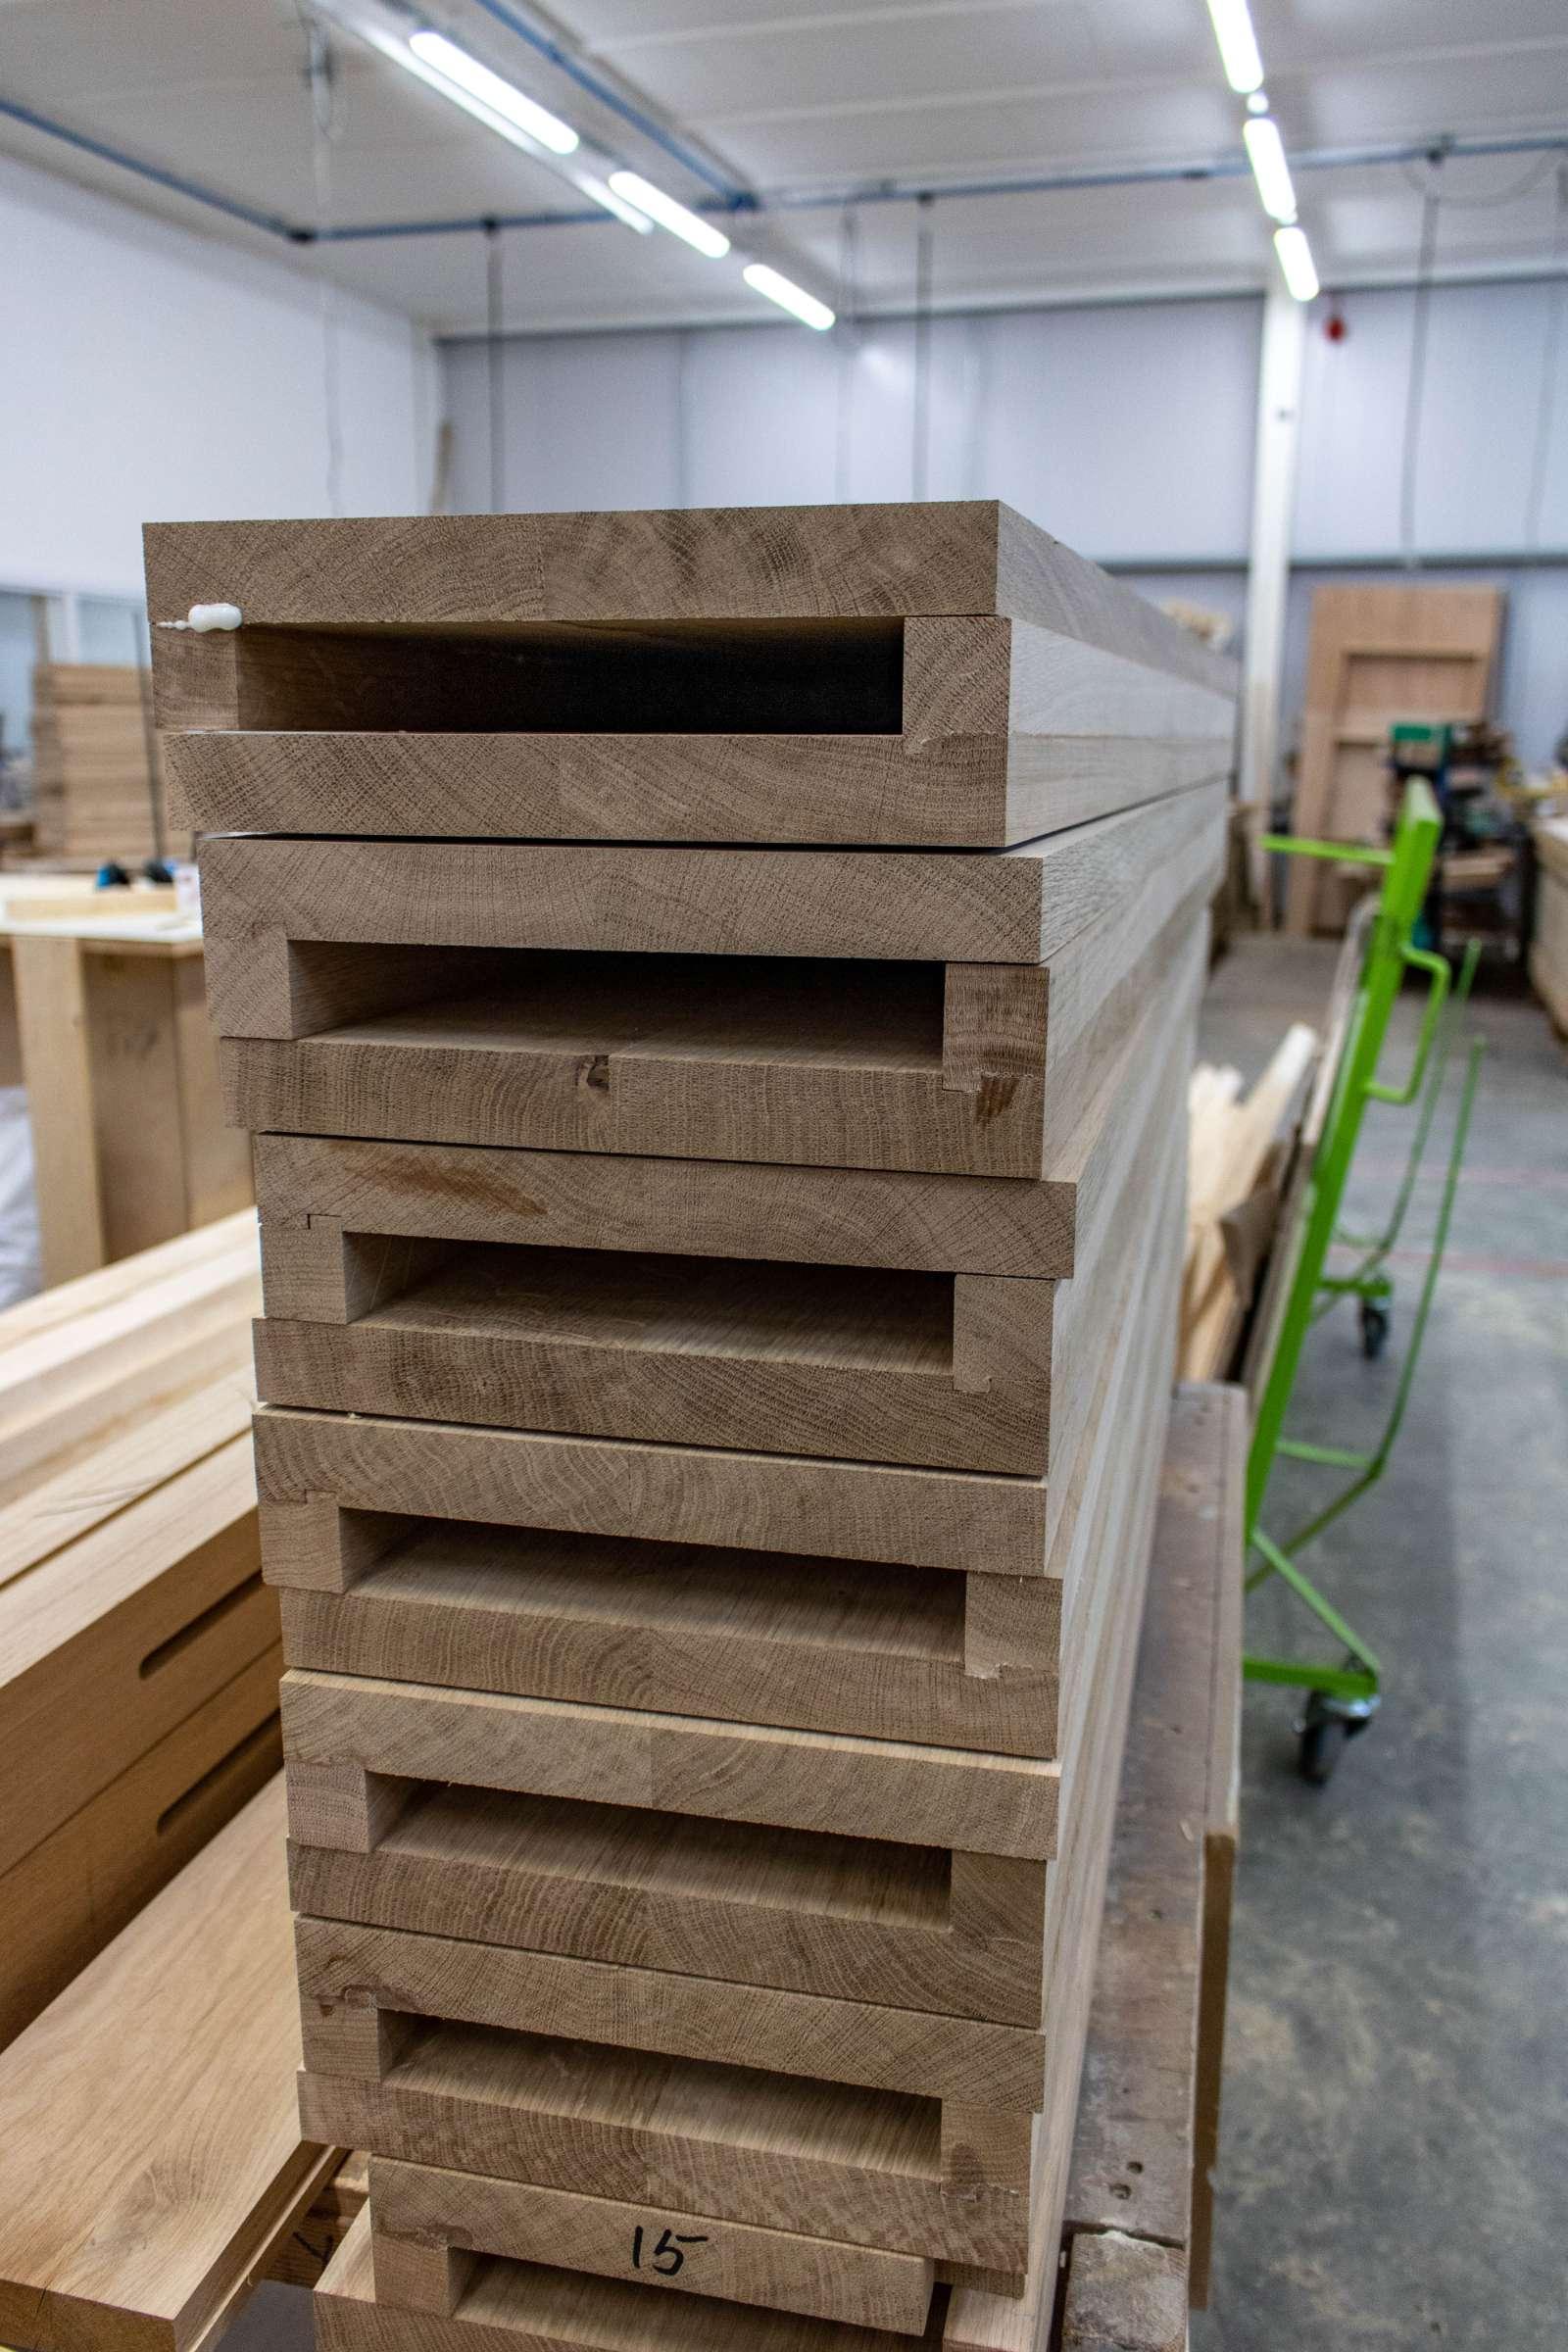 Kandd wood design